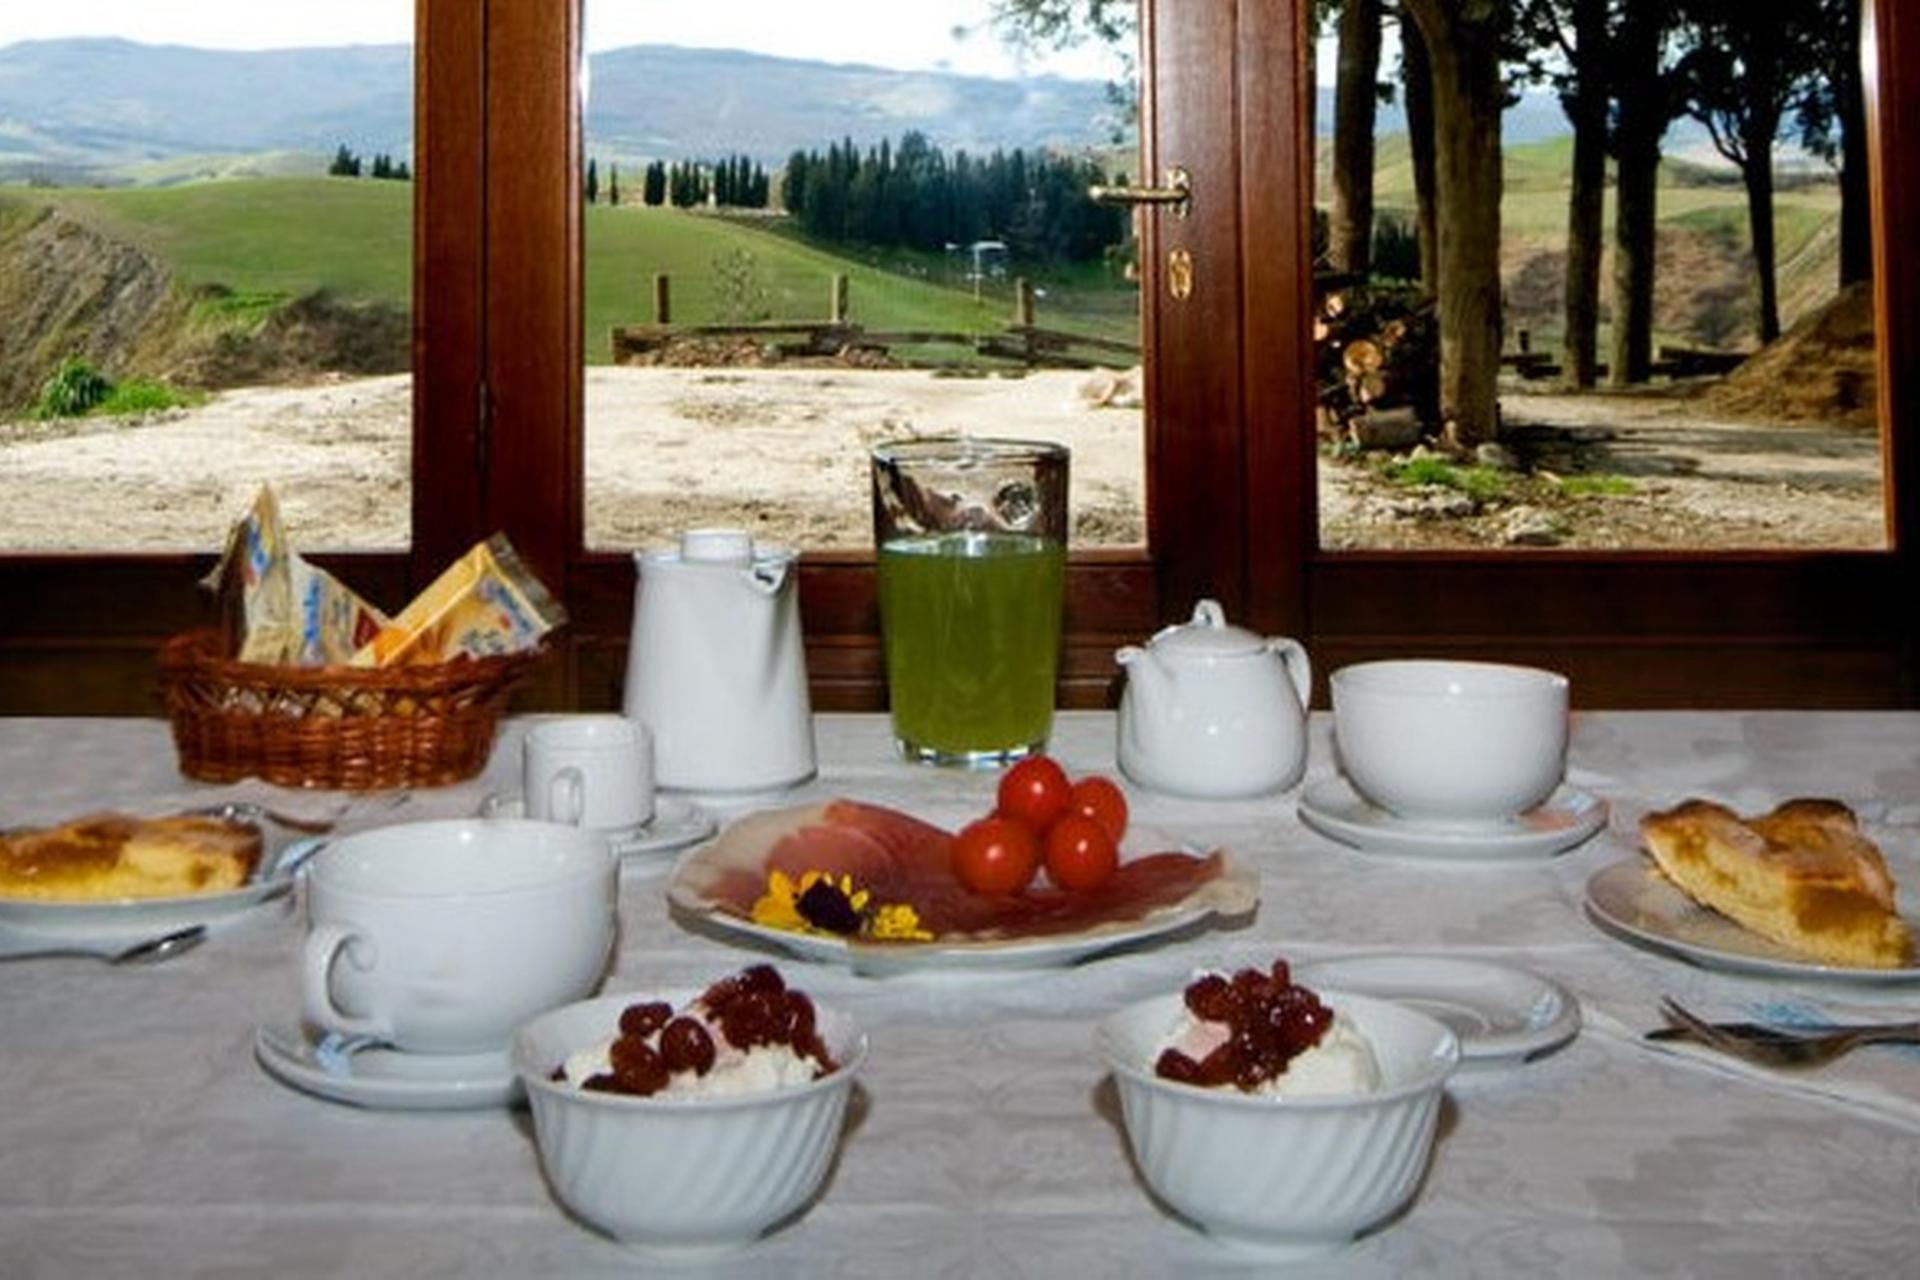 Agriturismo Toscana Accogliente agriturismo in Toscana dove la mamma cucina